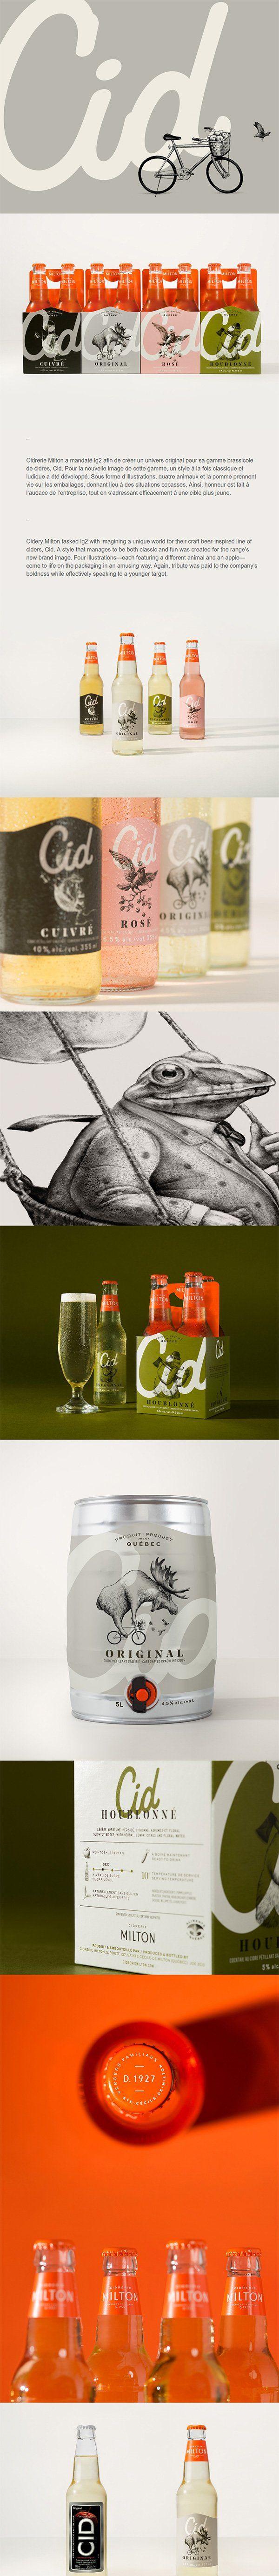 Cid Bottle Packaging